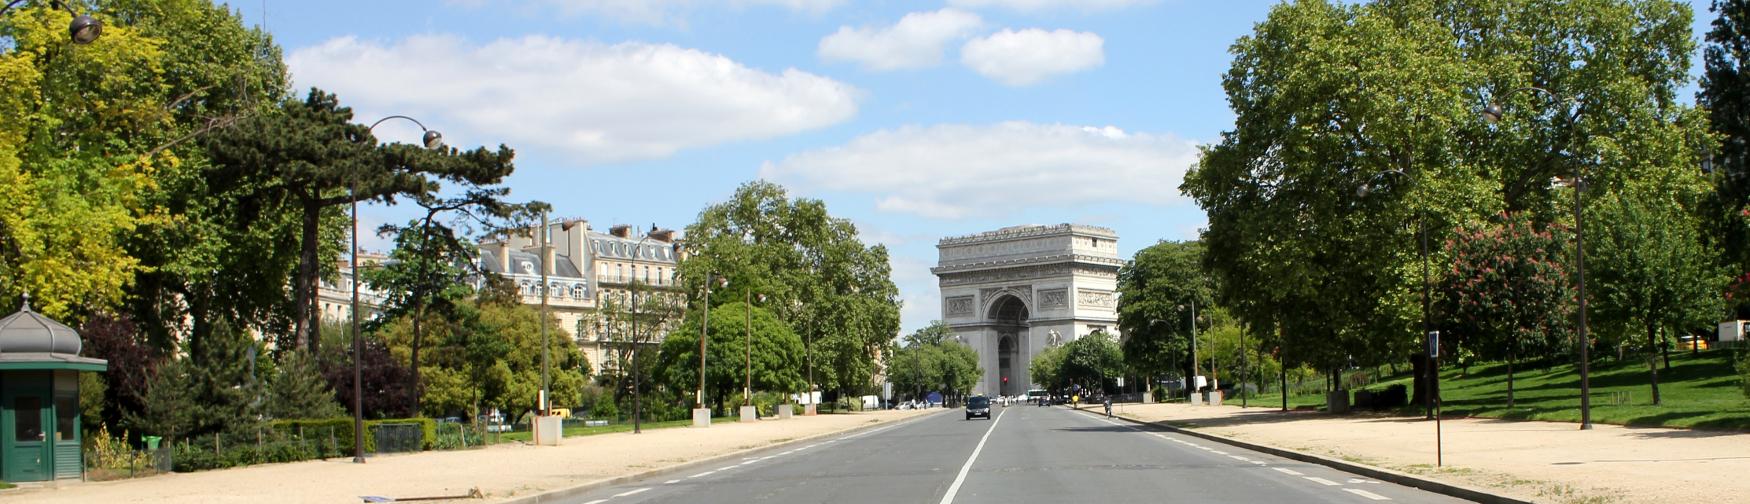 London to Paris Cycle Ride